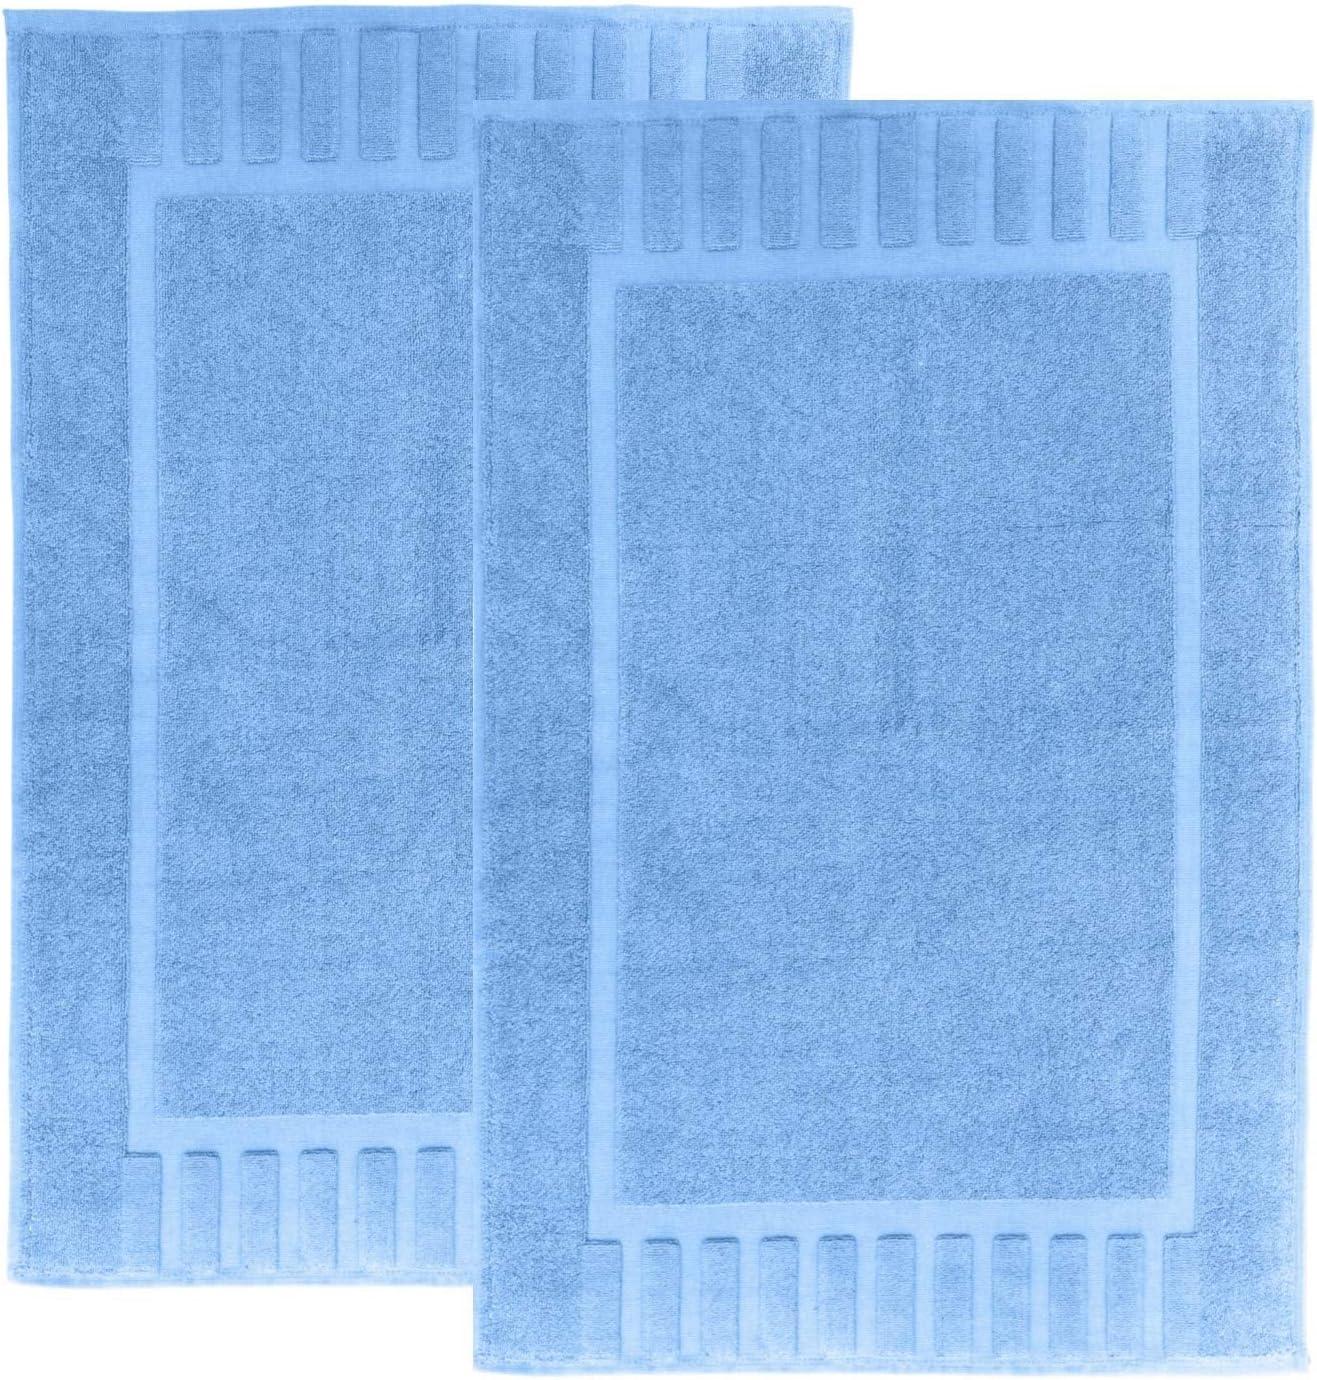 "White Classic Luxury Bath Mat Floor Towel Set - Absorbent Cotton Hotel Spa Shower/Bathtub Mats [Not a Bathroom Rug] 22""x34"" | 2 Pack | Light Blue"